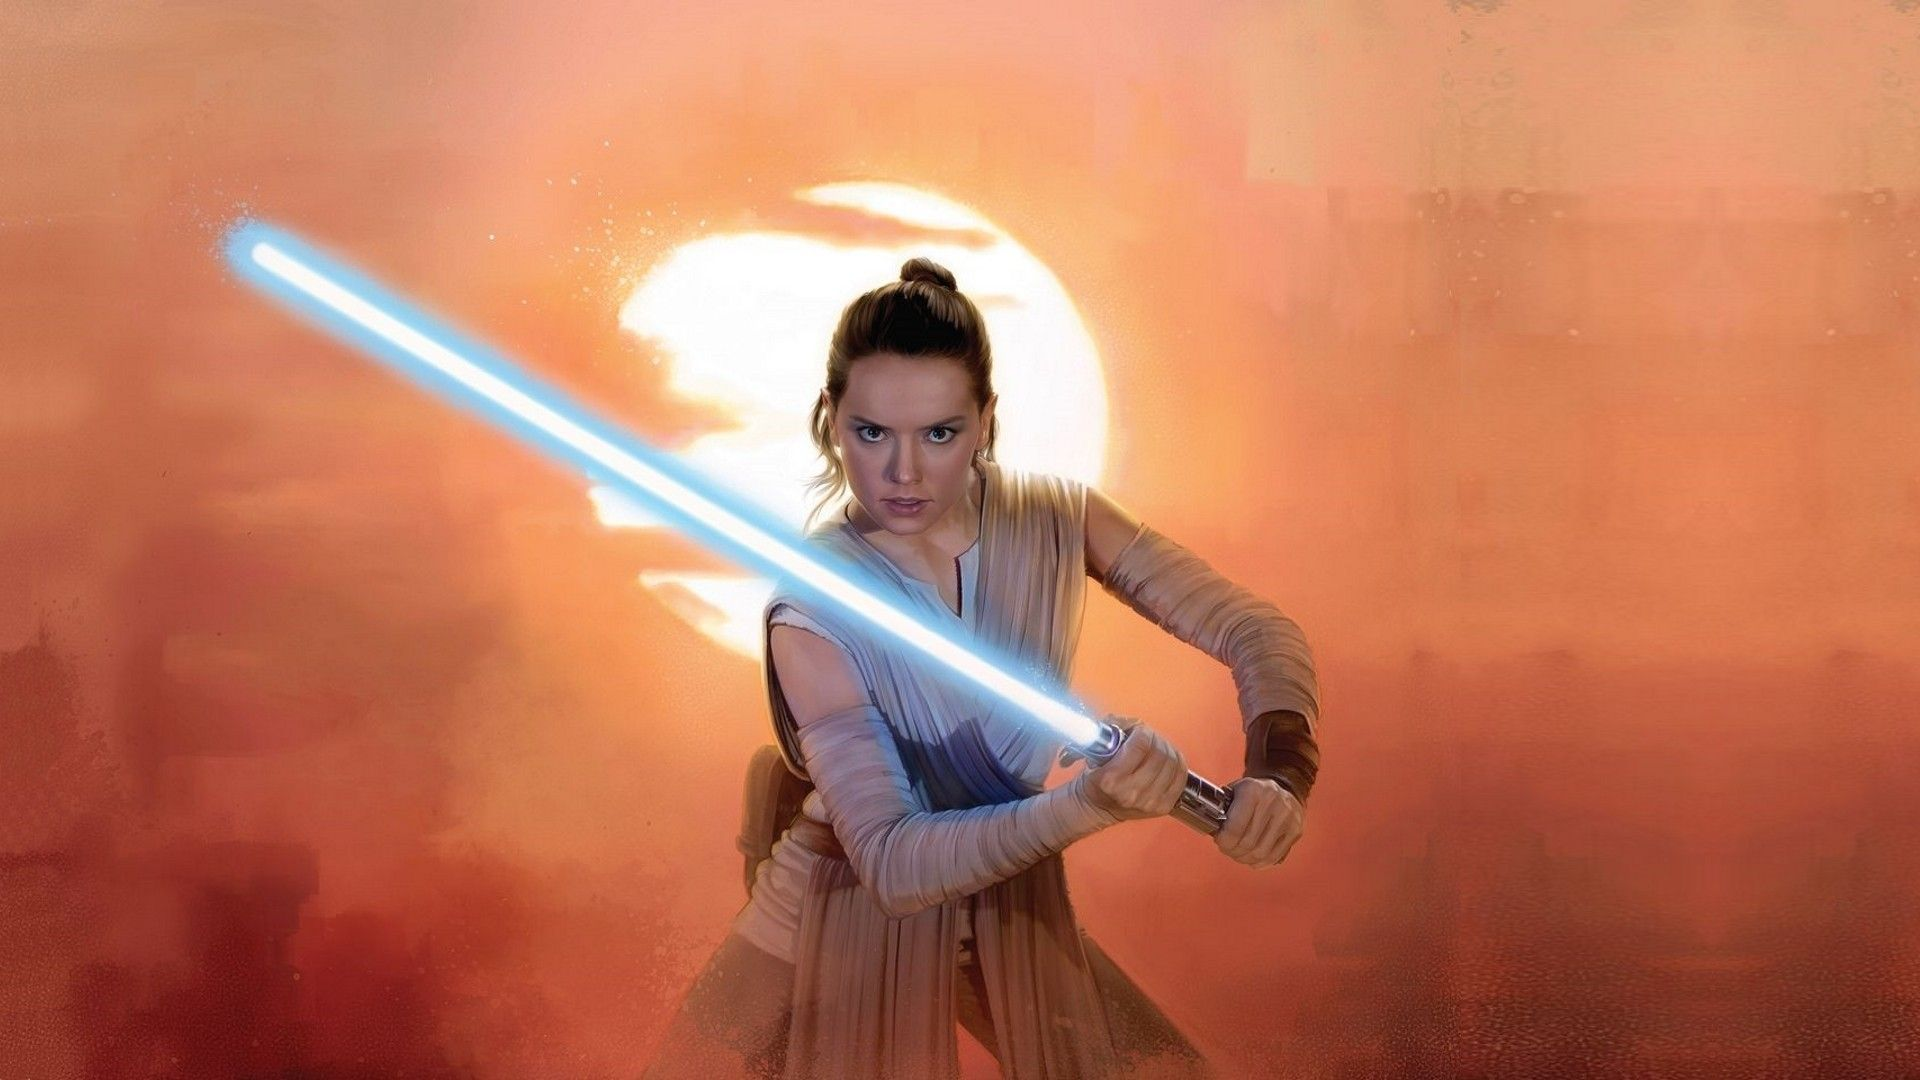 Latest Daisy Ridley Wallpapers New Hd Wallpapers Download Rey Star Wars Star Wars Wallpaper Star Wars Film